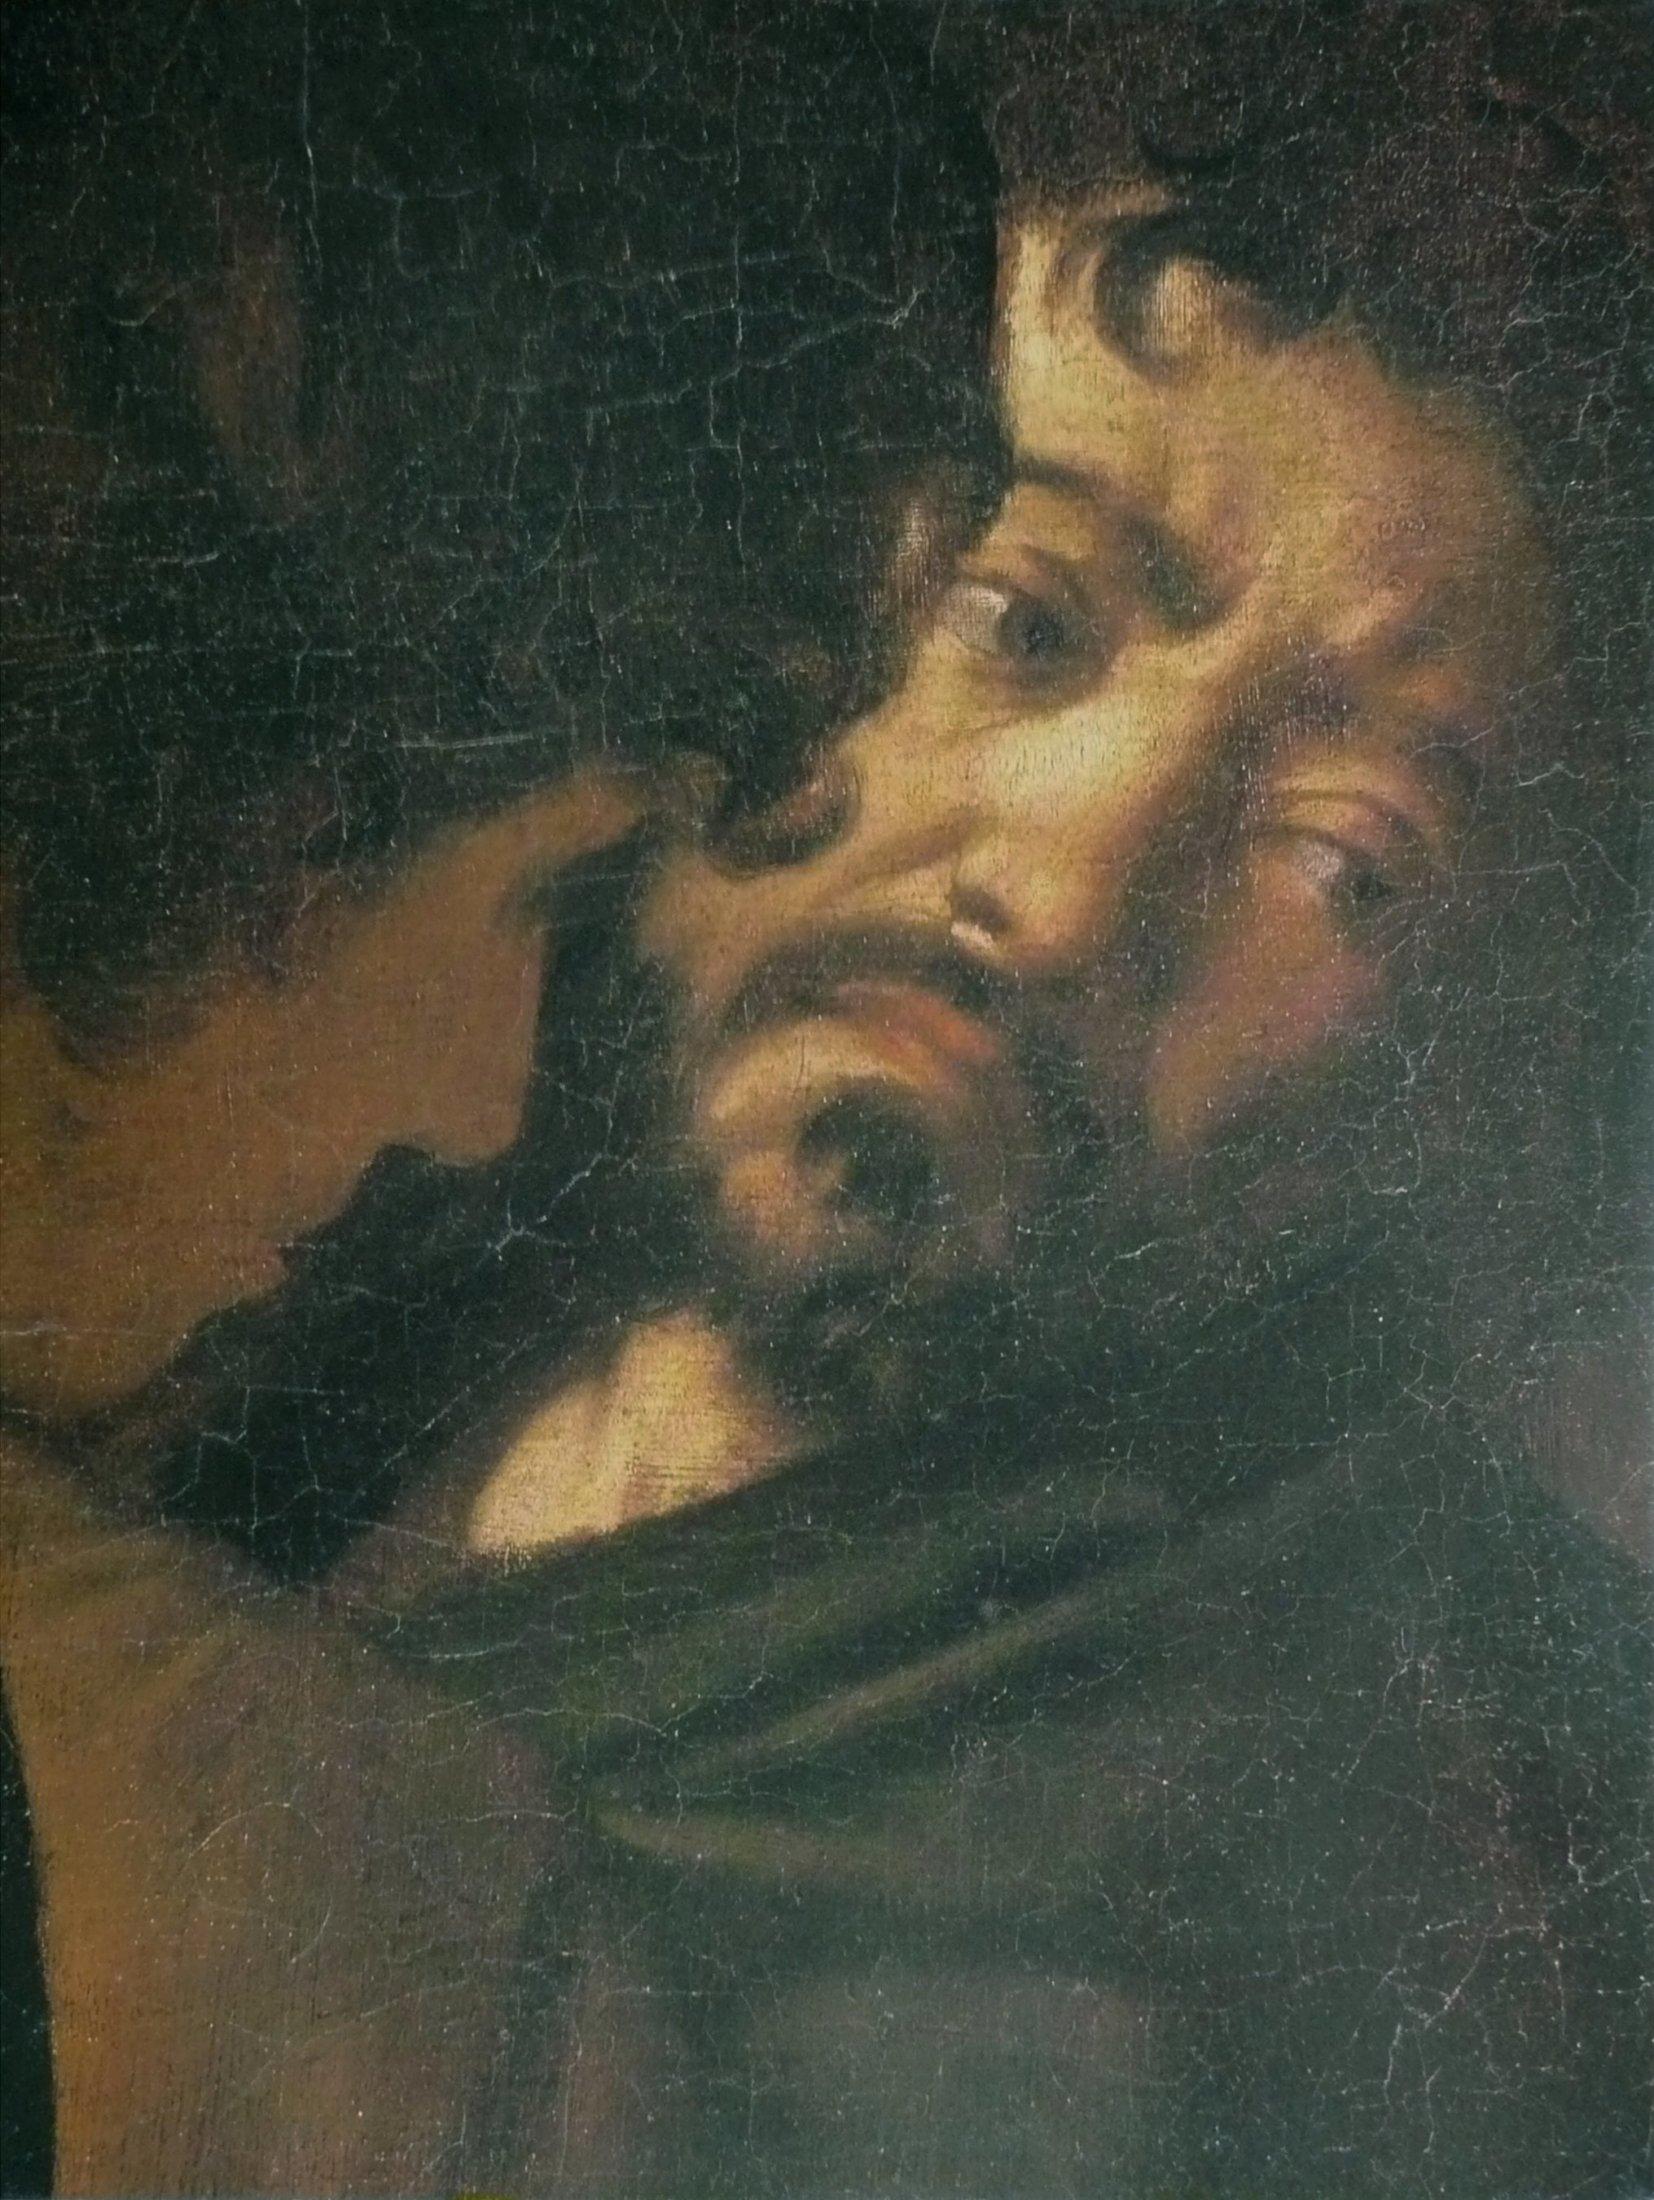 Michelangelo Merisi Da Caravaggio - Le Martyre De Saint Matthieu